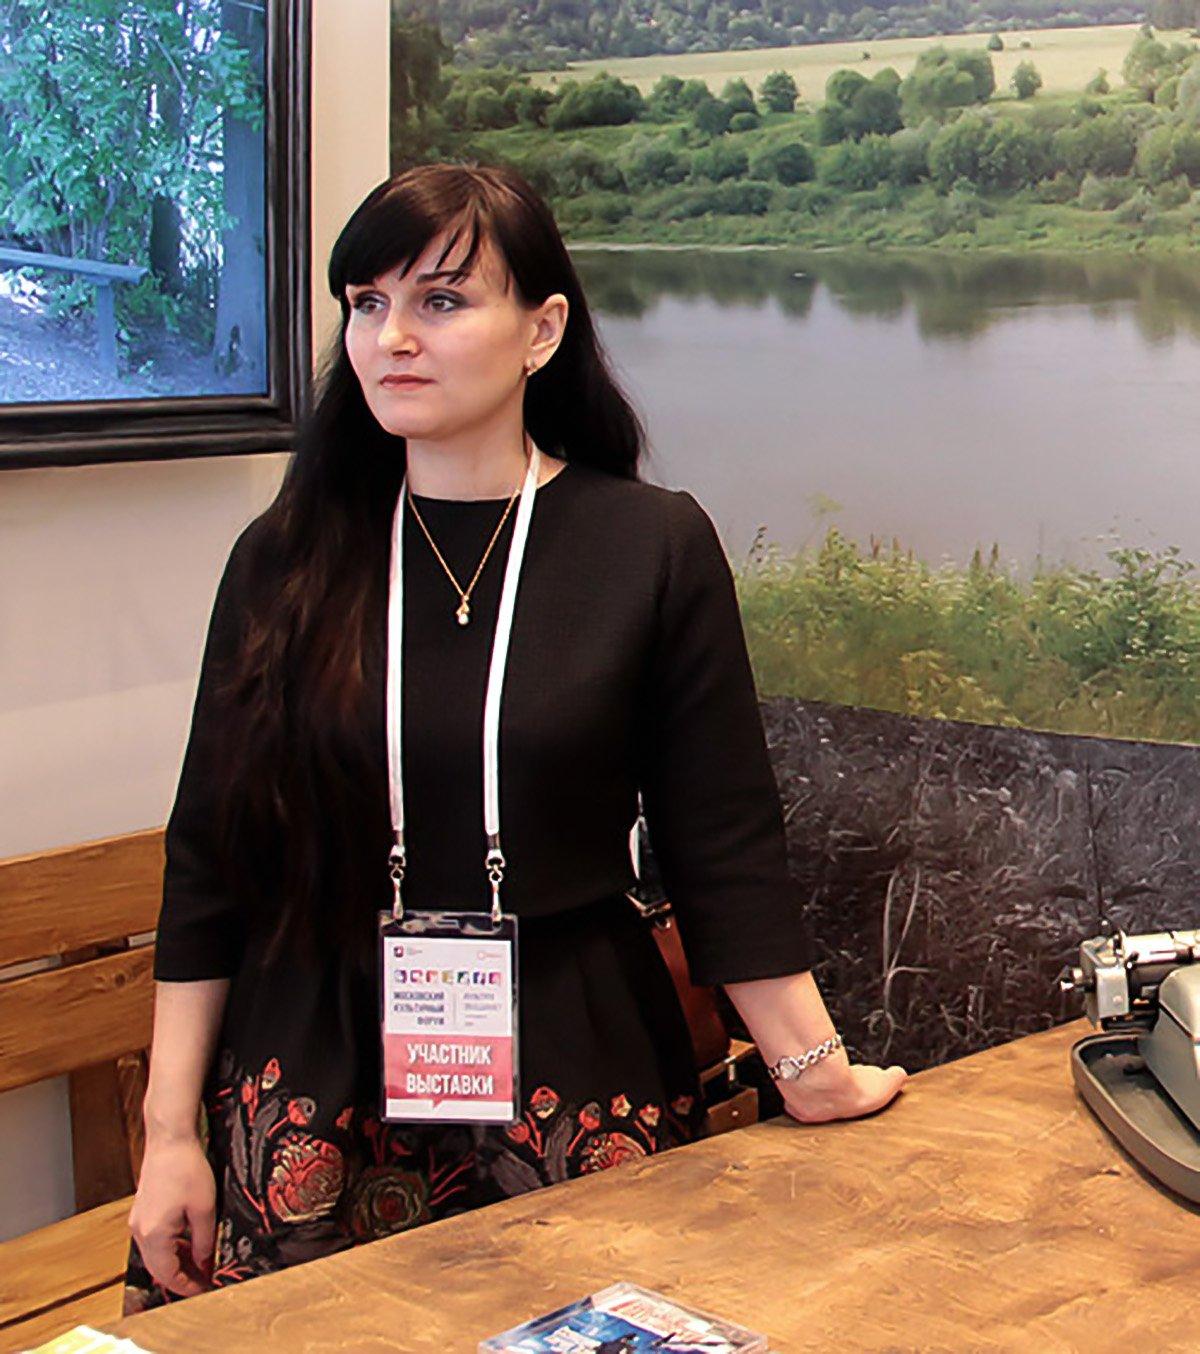 Irina Pakhomova, chief curator of the Paustovsky Museum